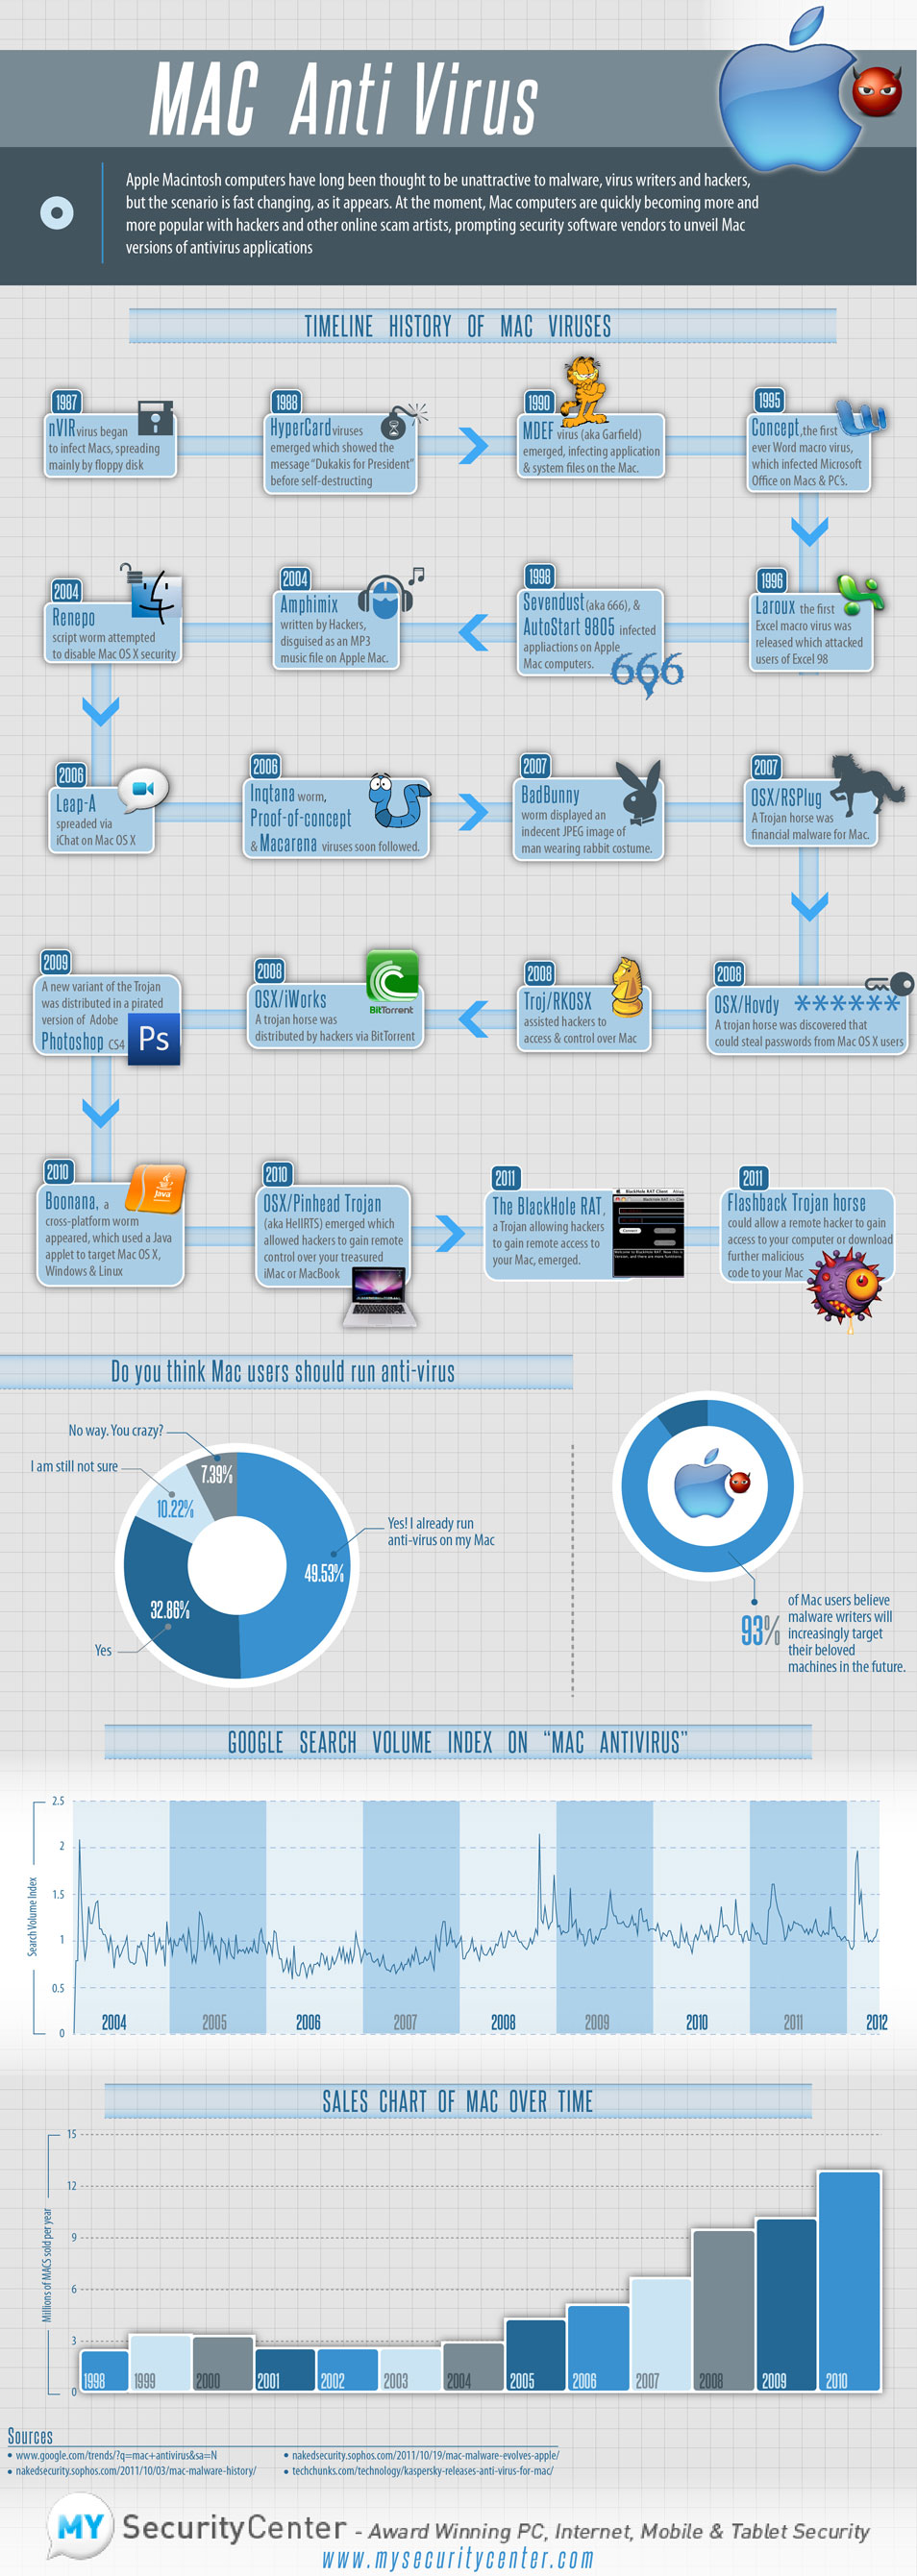 Mac virus timeline